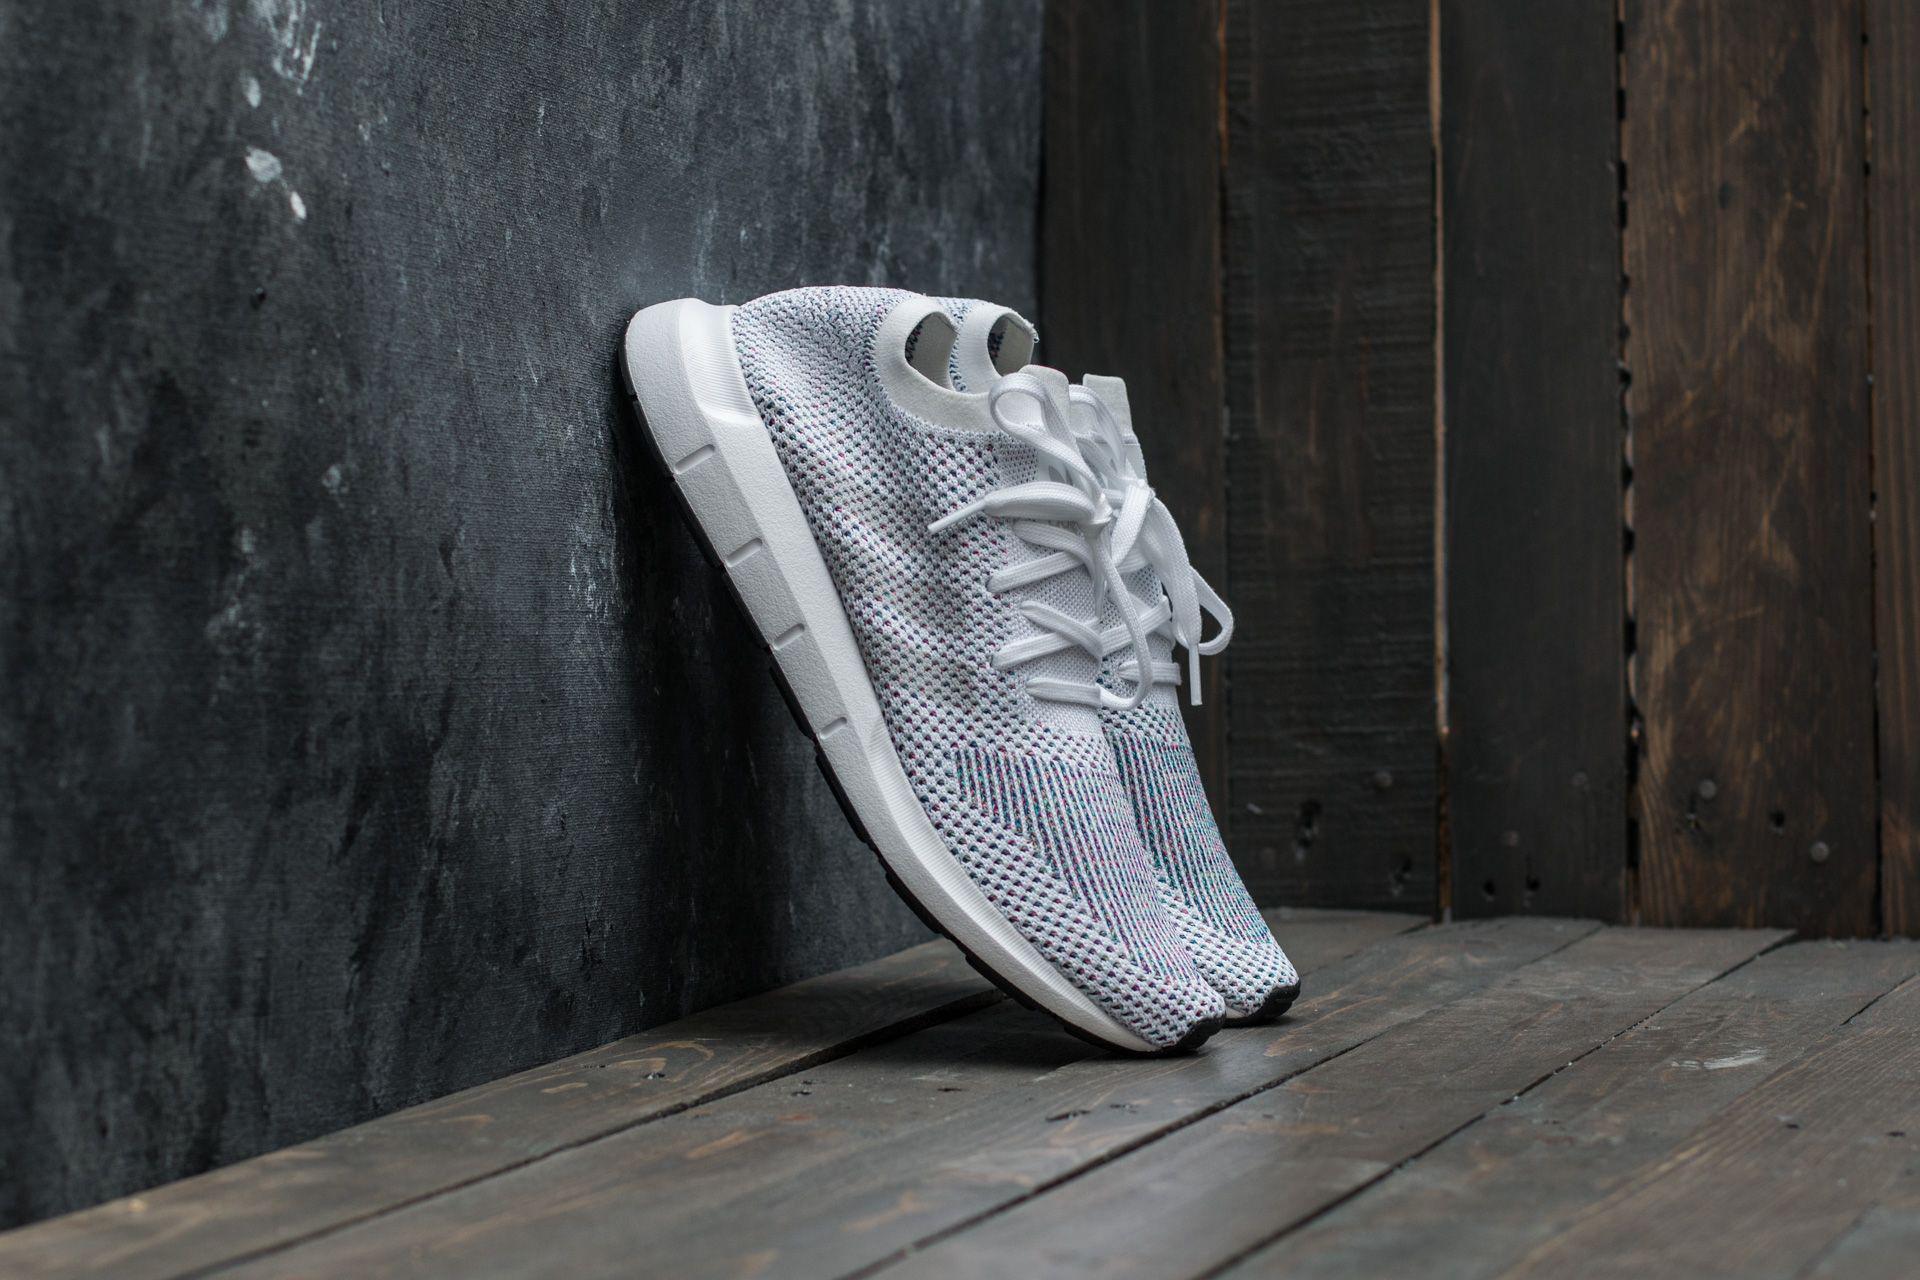 bc5d95ed1 Lyst - adidas Originals Adidas Swift Run Primeknit Ftw White  Grey ...